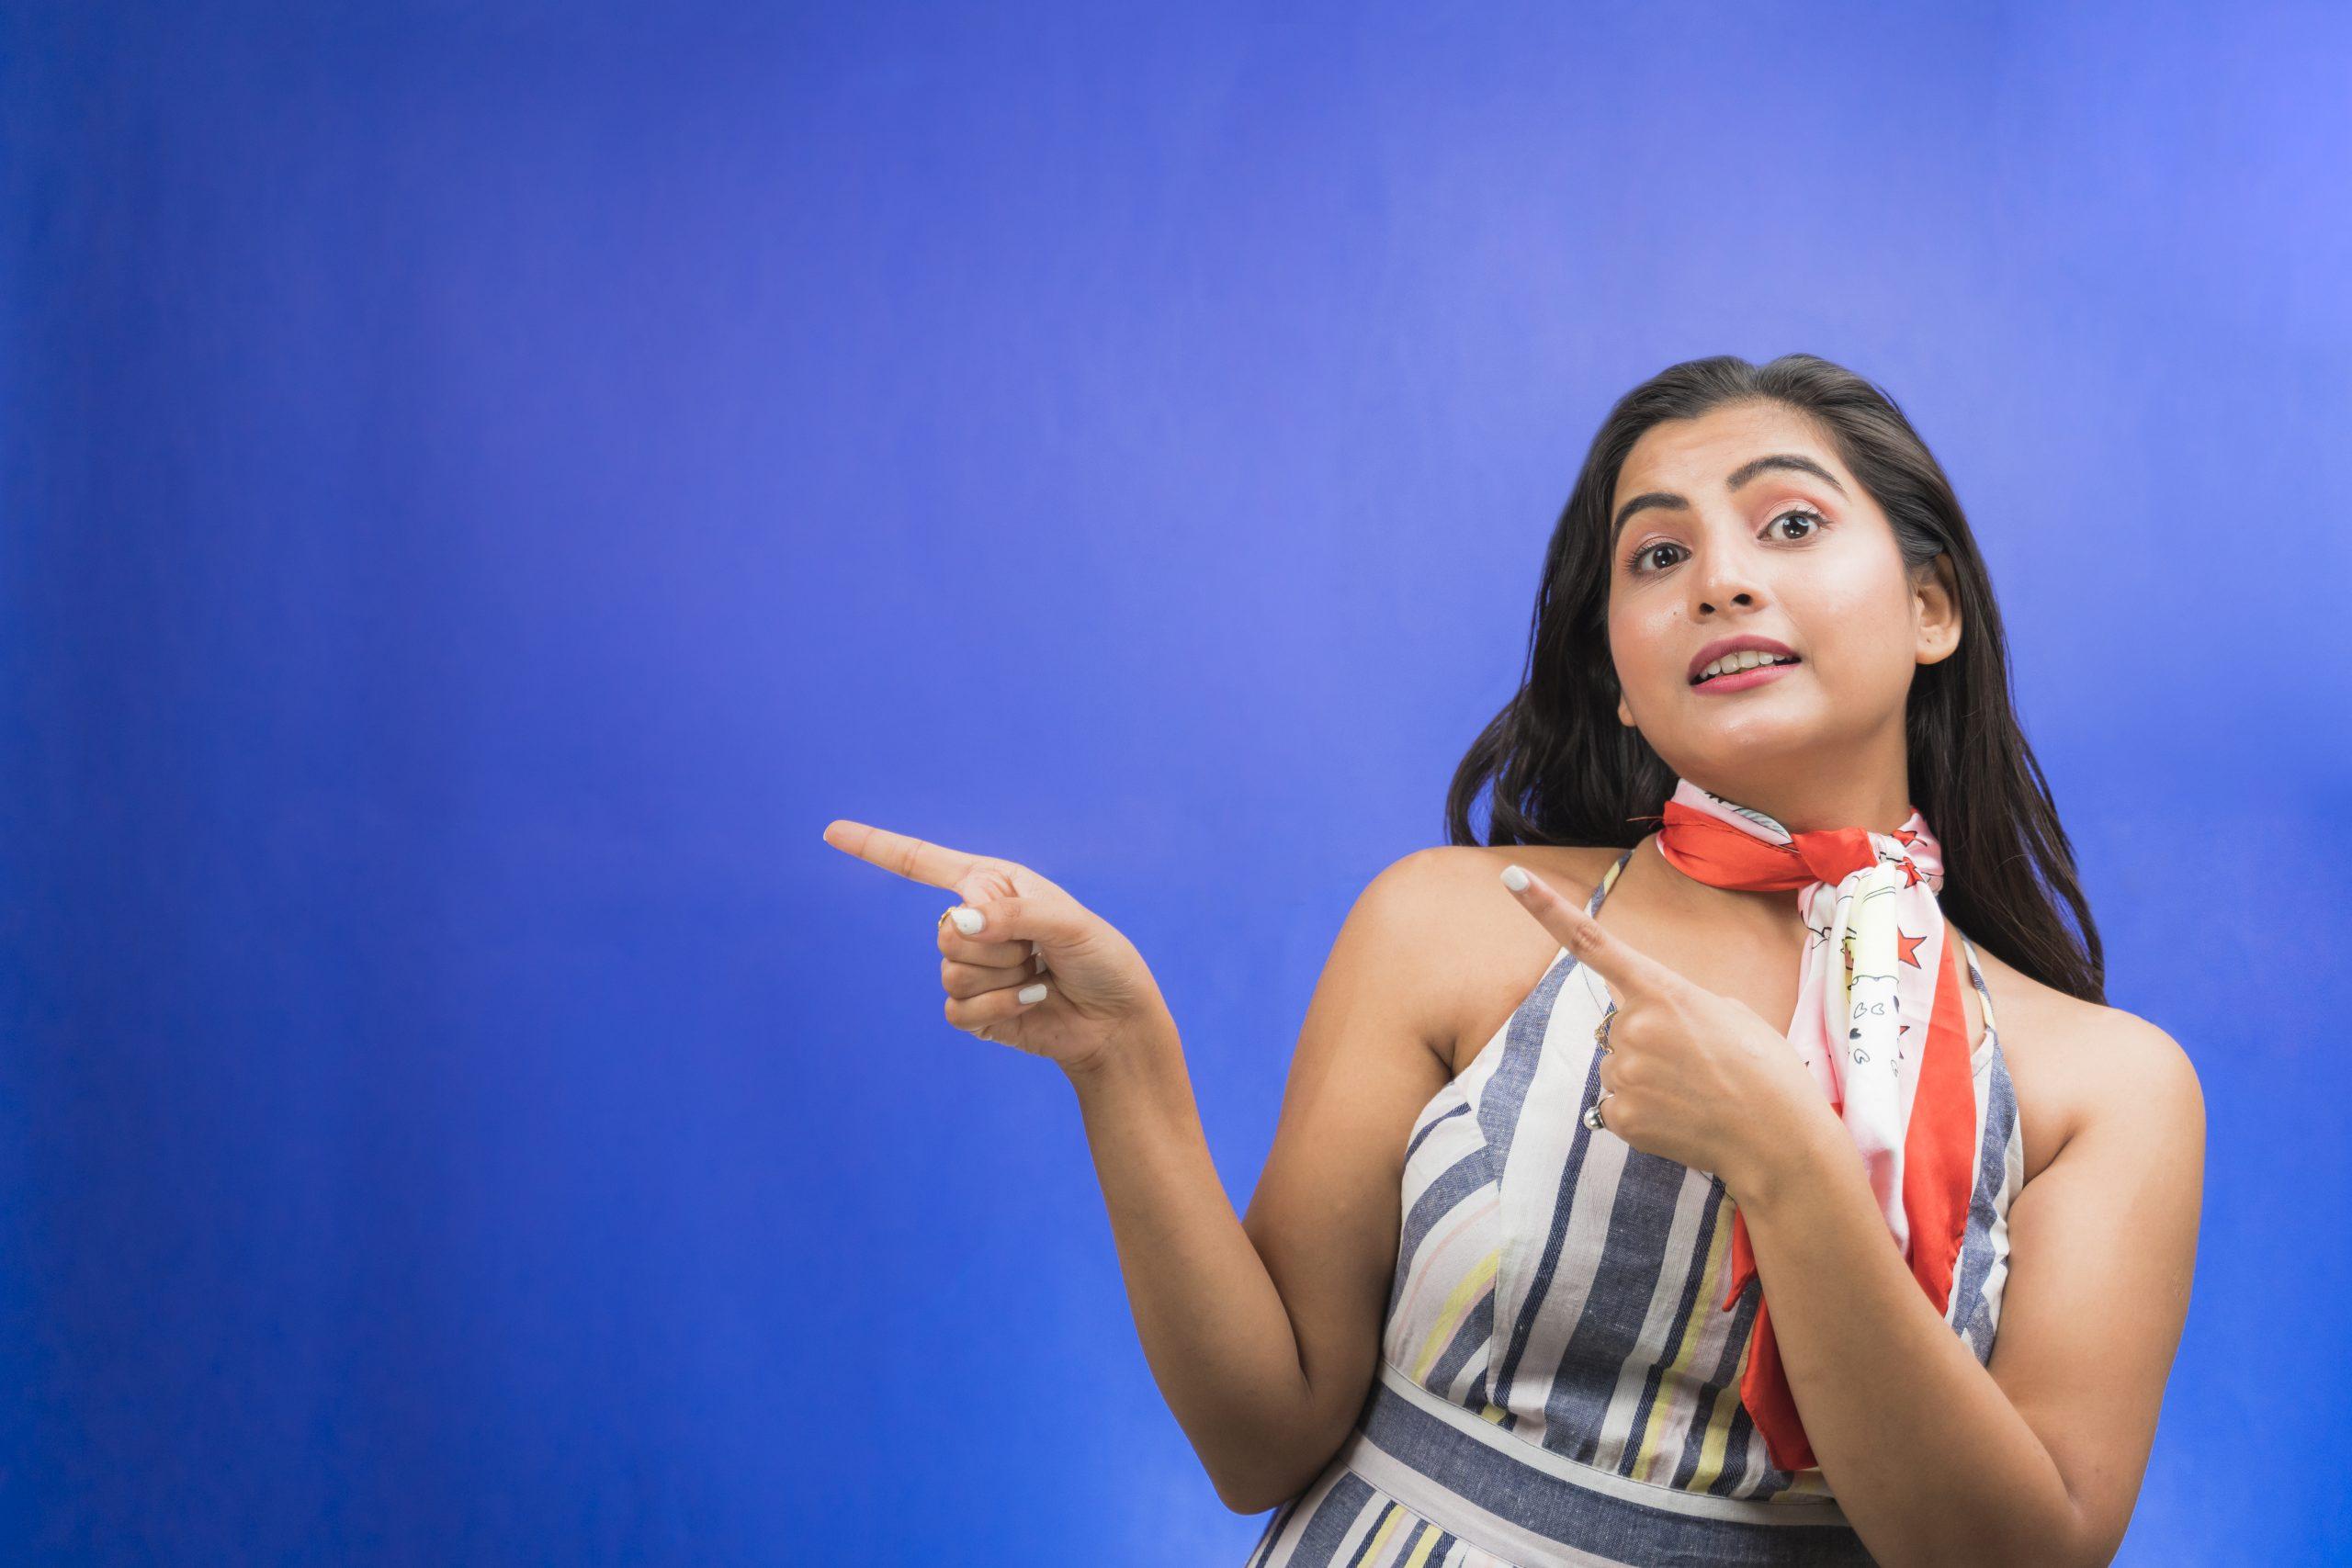 indian girl pointing sideways